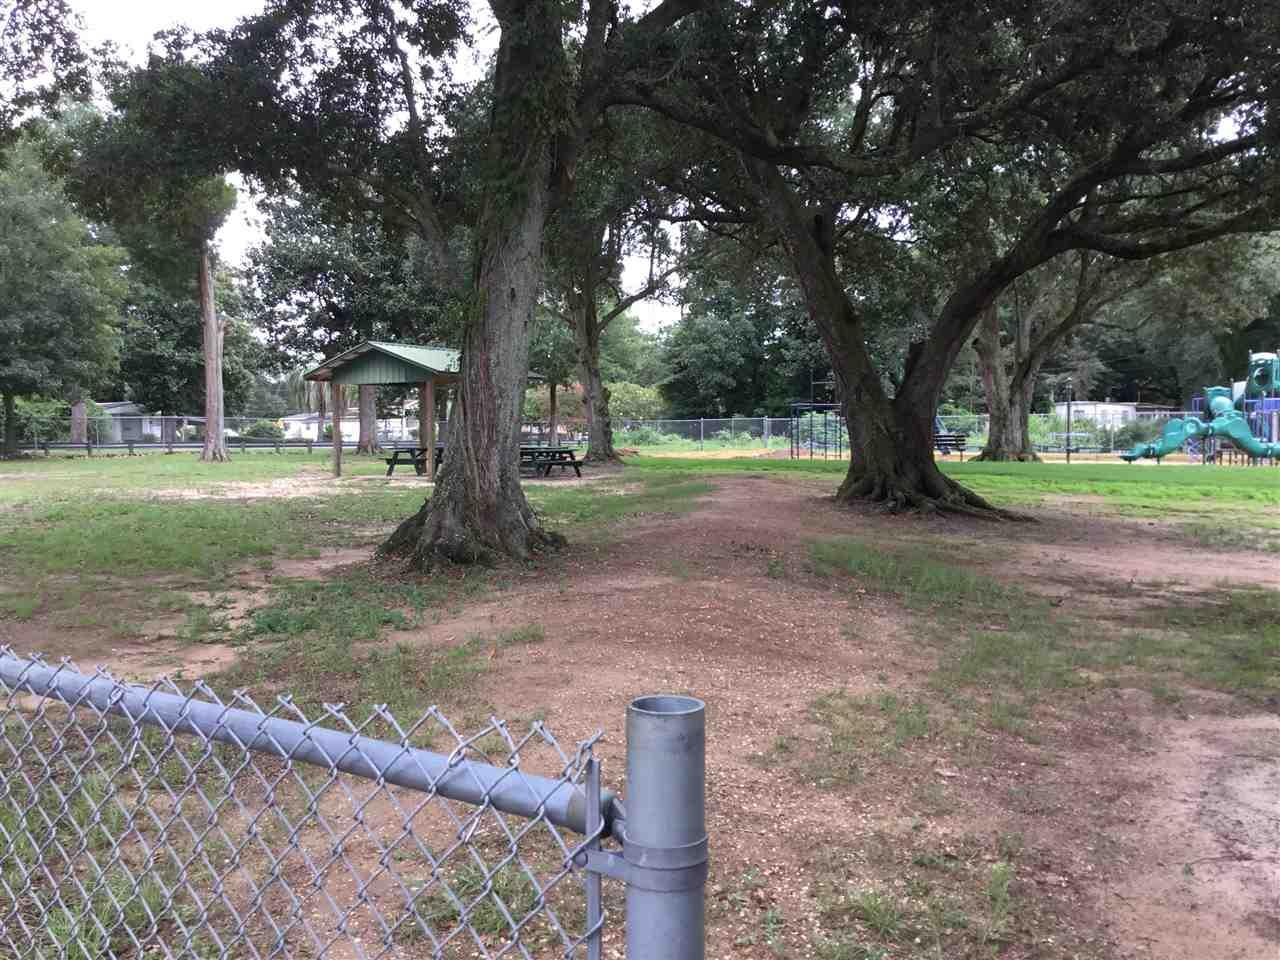 Lot 44 Andrew Jackson Dr, Pace, FL 32571